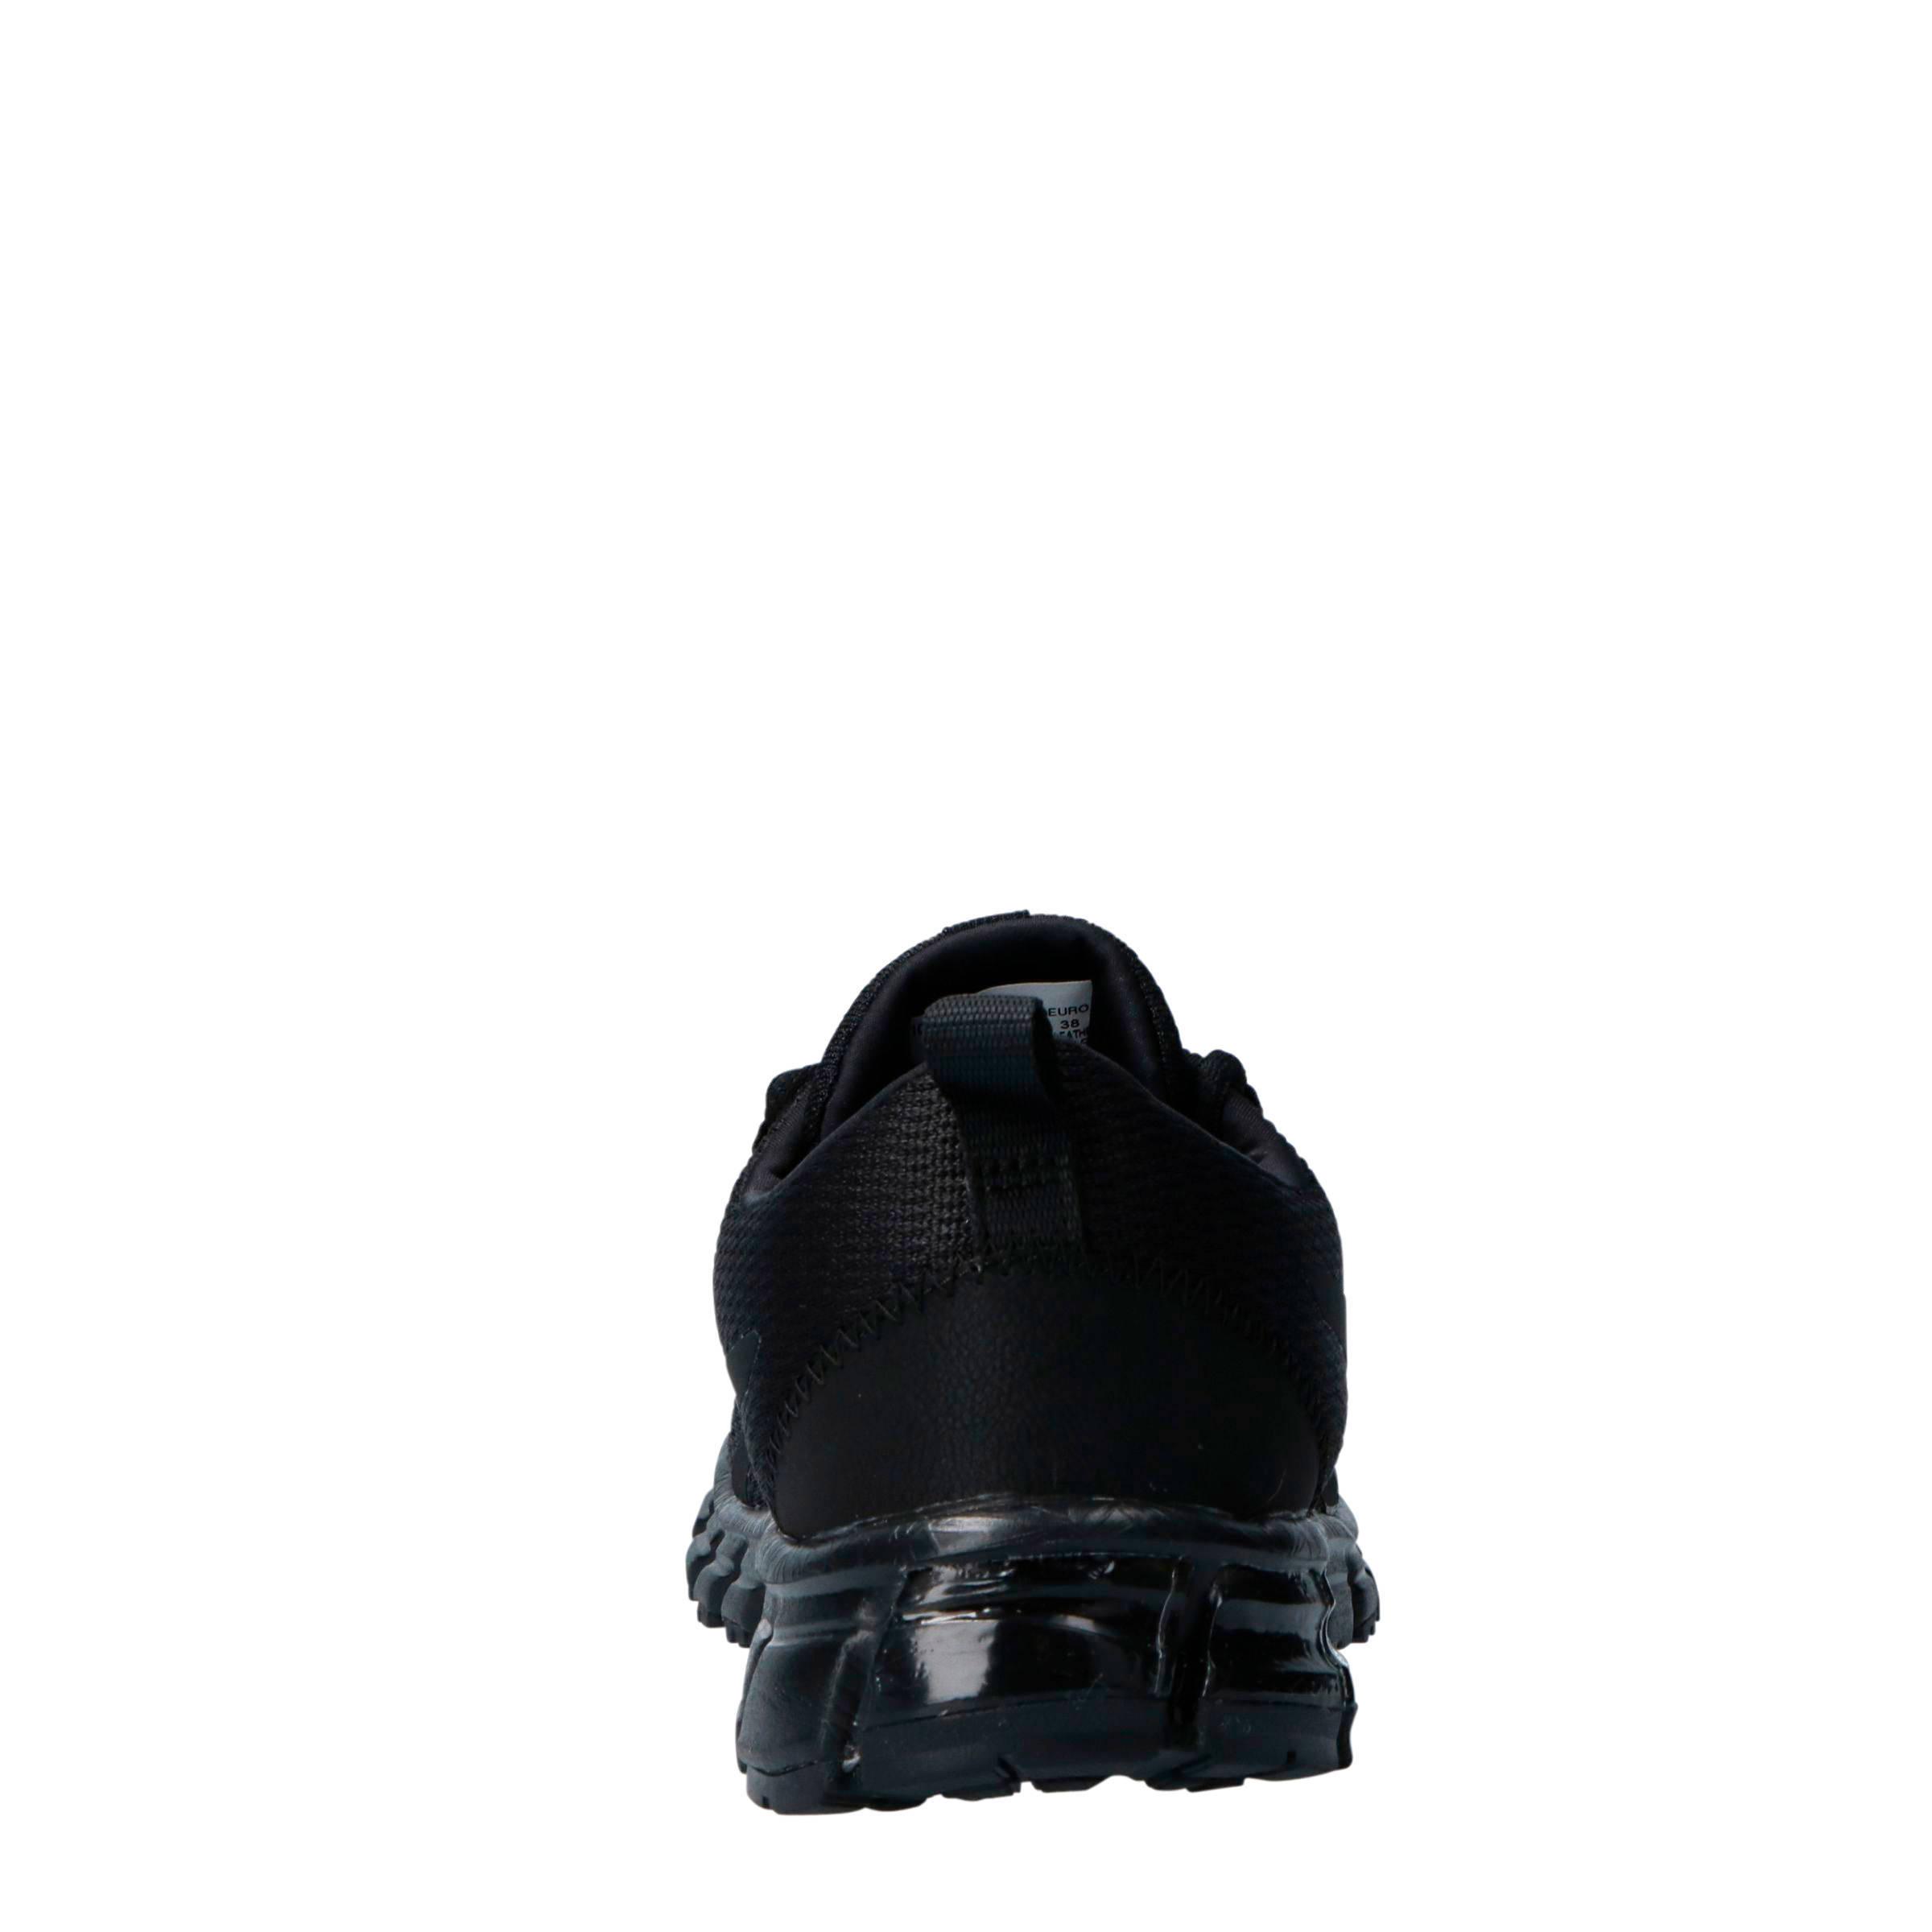 c7f18107901 ASICS Gel Quantum 90 hardloopschoenen | wehkamp